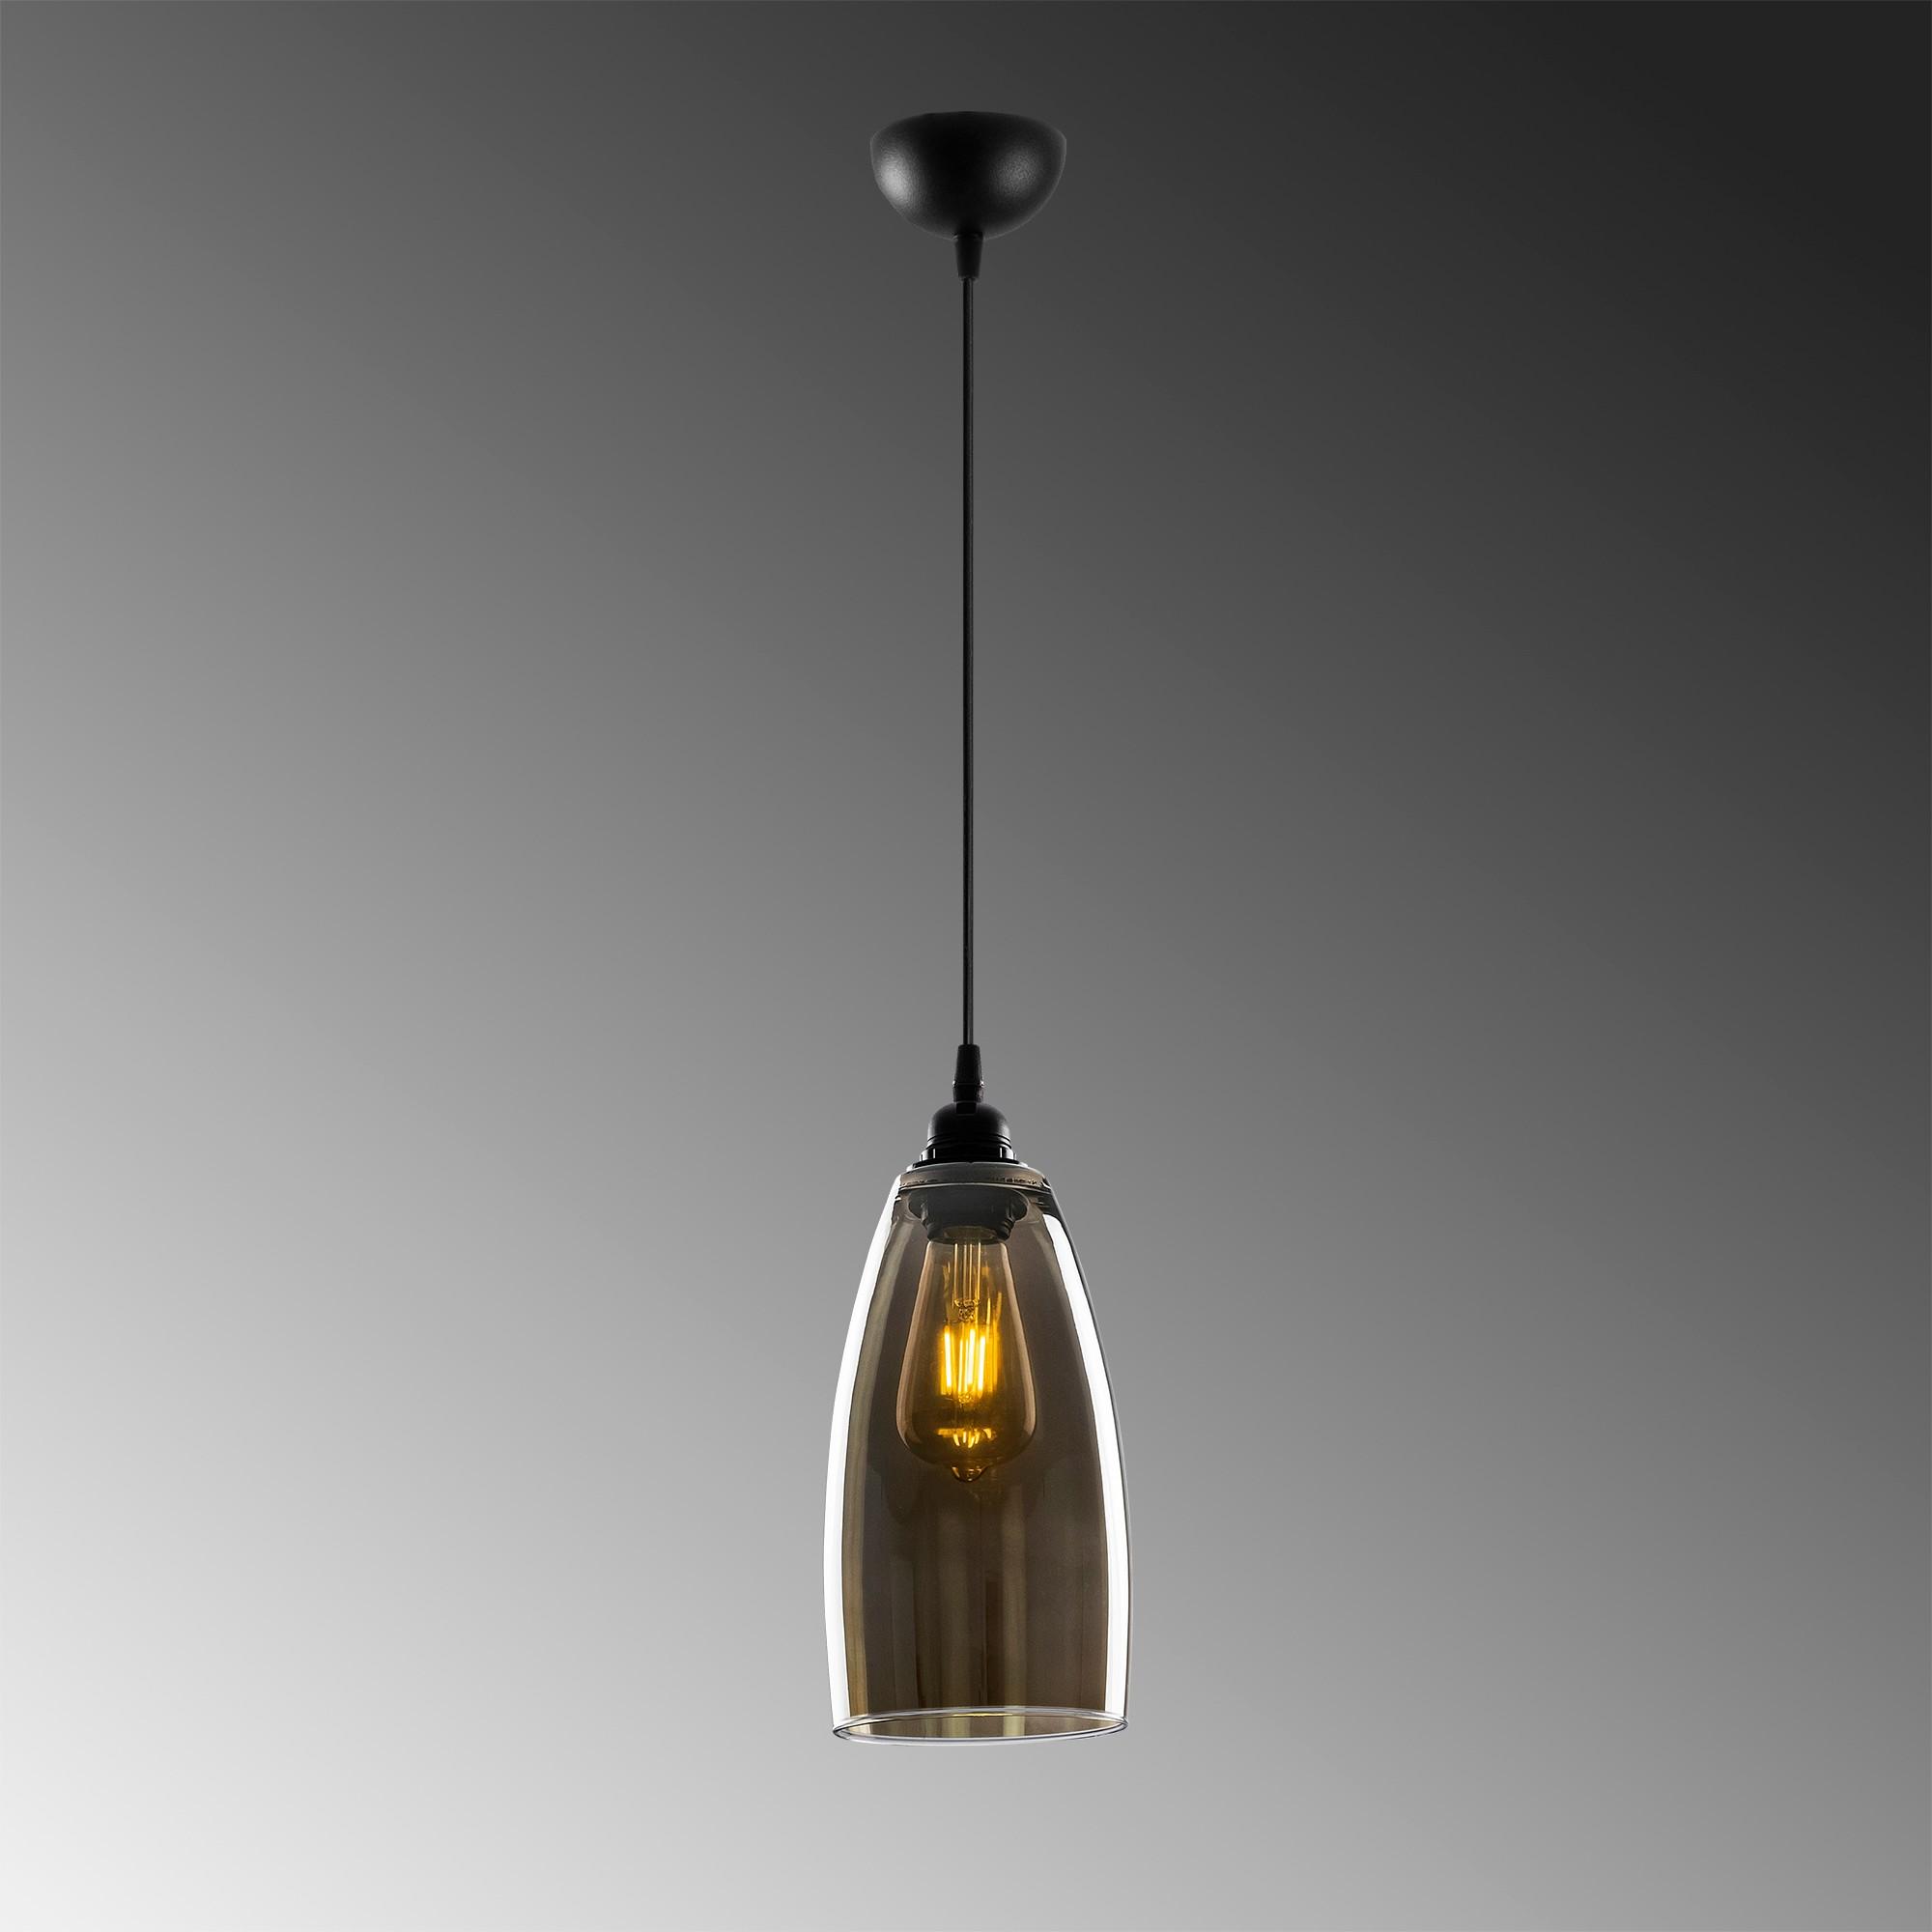 Hanglamp glad smoked glass langwerpig 1 x E27 fitting - grijze achtergrond